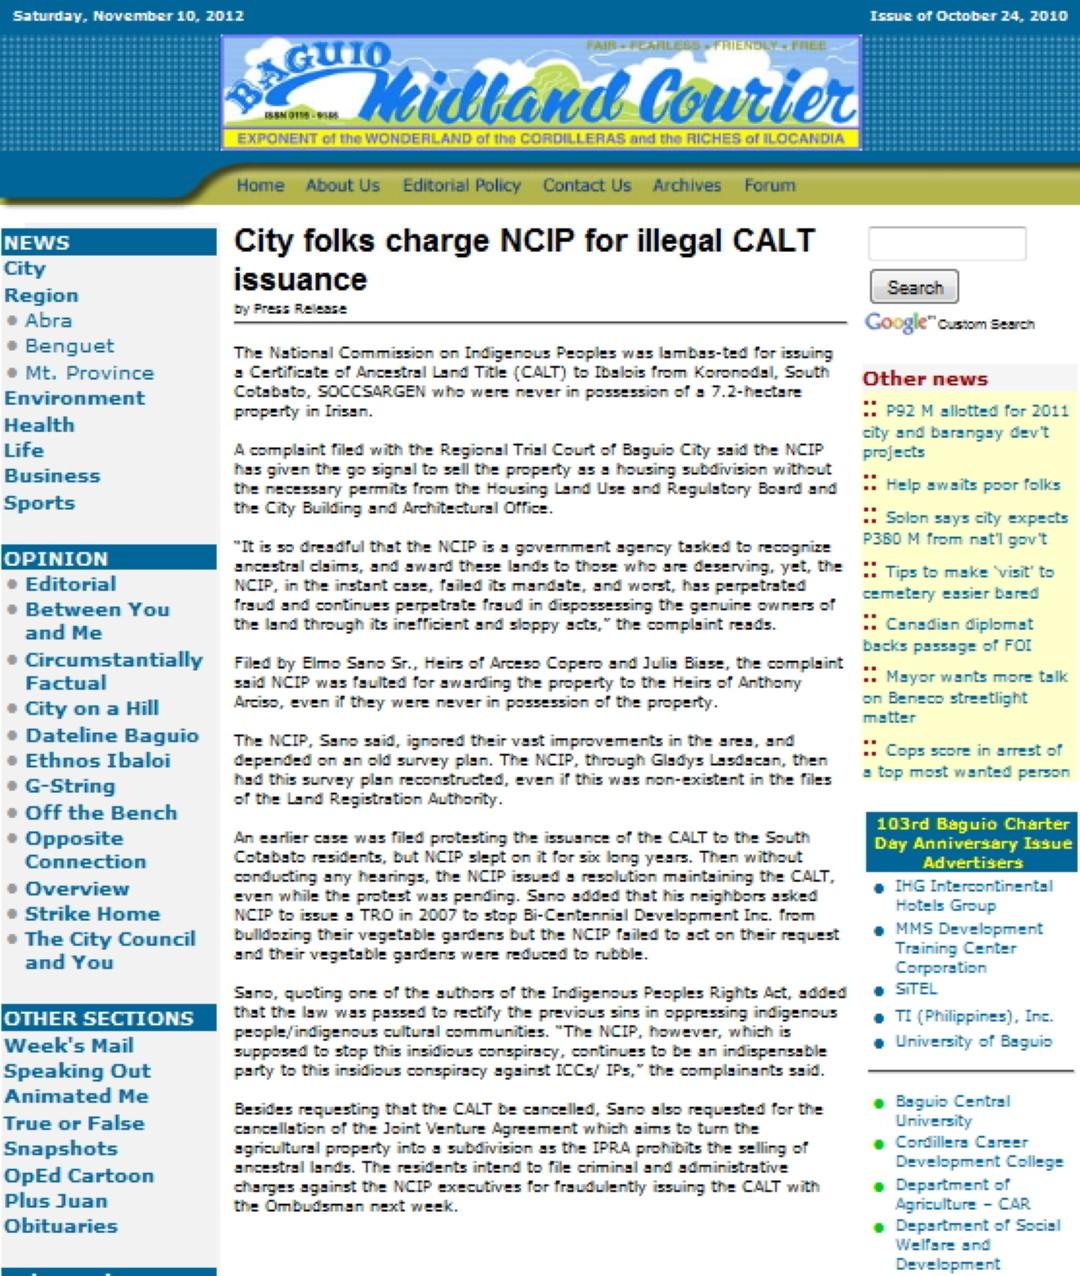 Mountain House Baguio Subd Updates Reviews: City folks